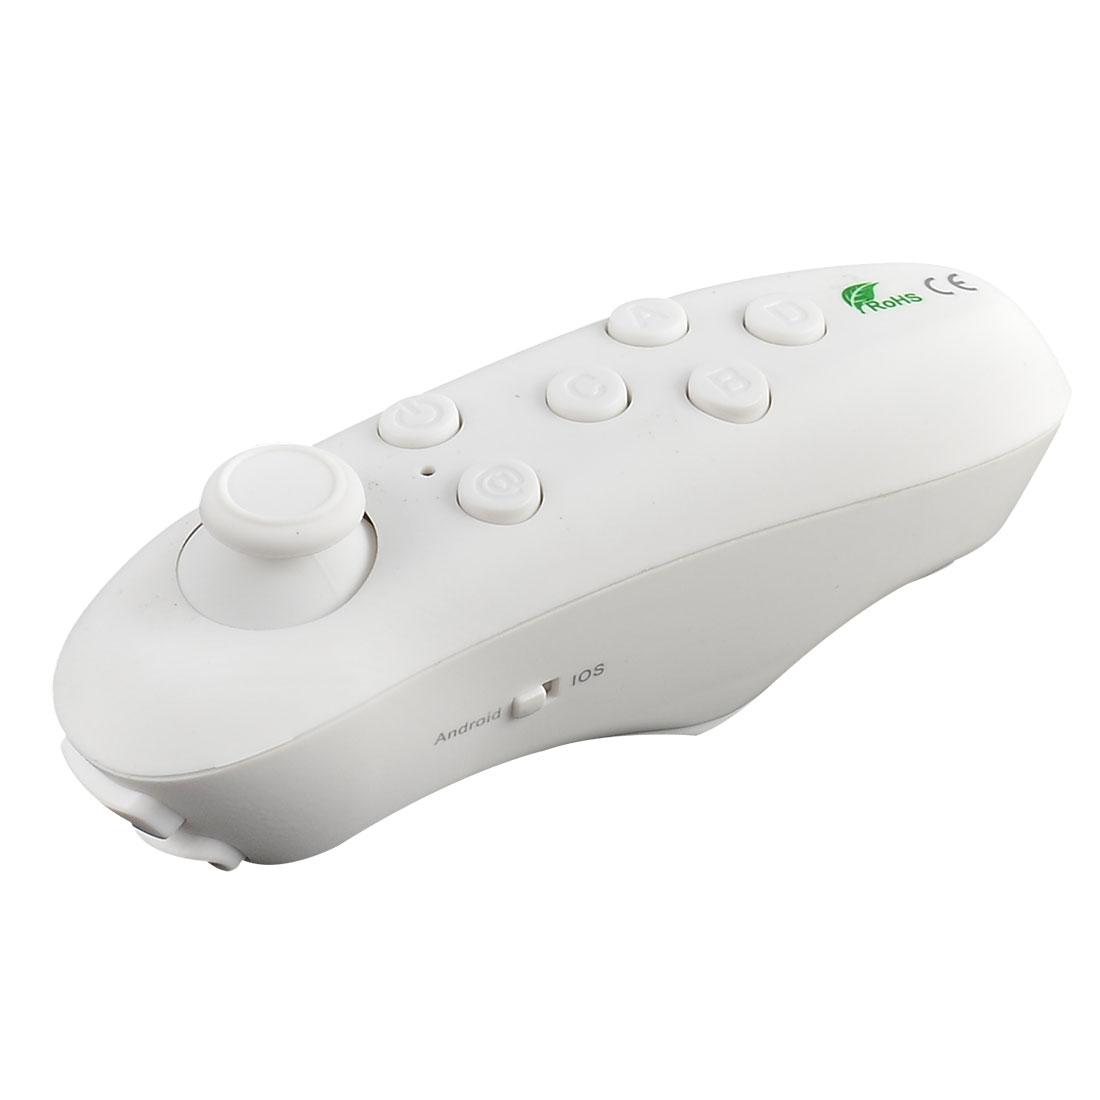 Universal Portable VR Glasses bluetooth Game Remote Control Handle White